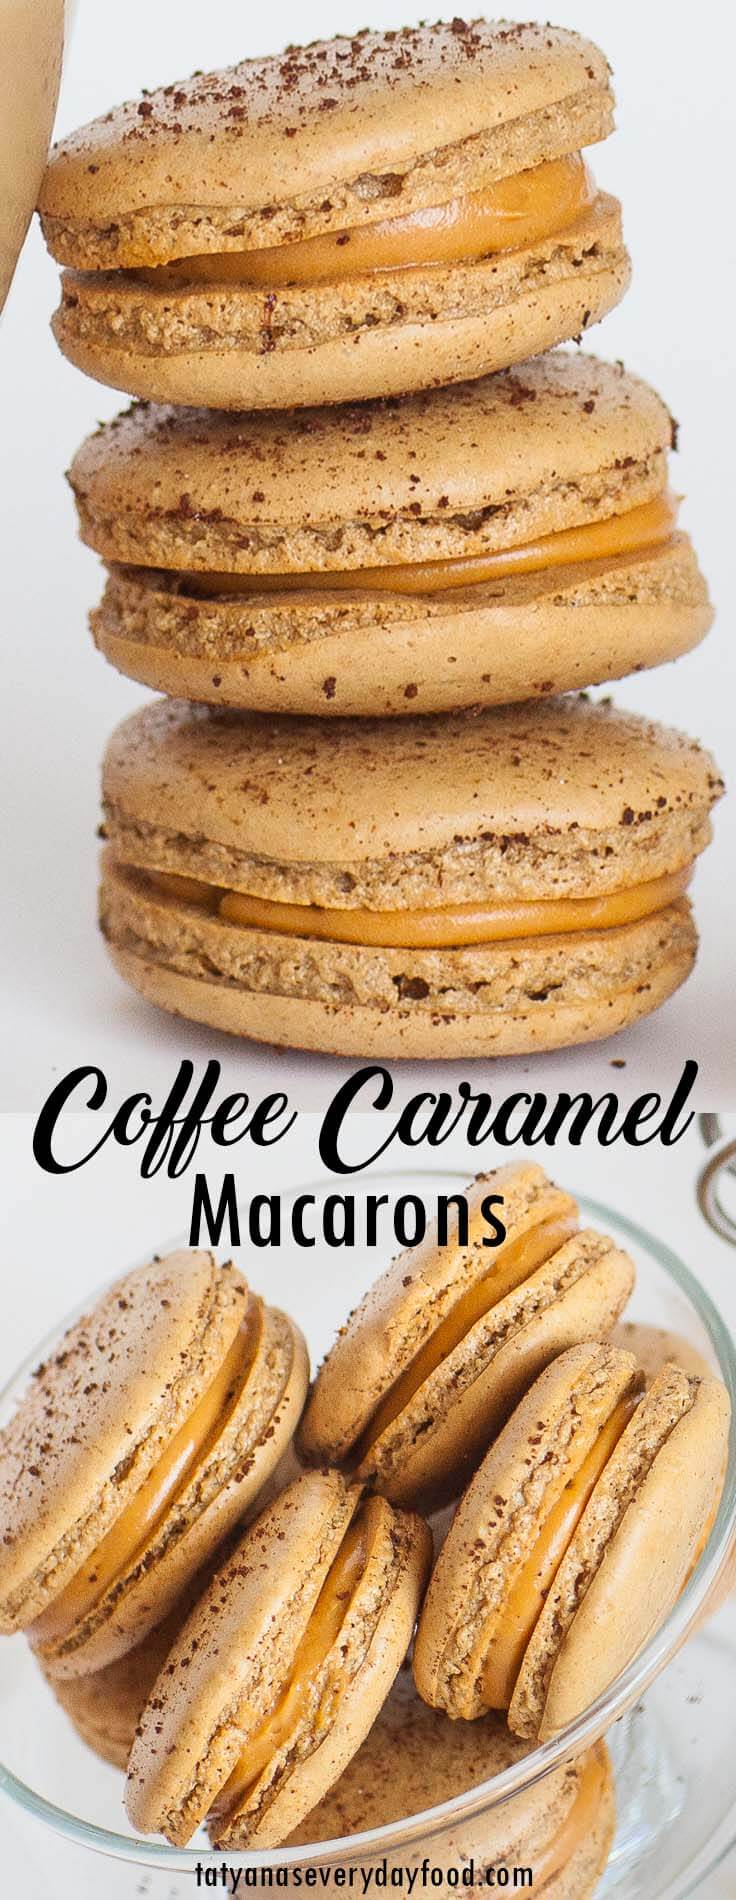 Caramel Coffee Macarons video recipe